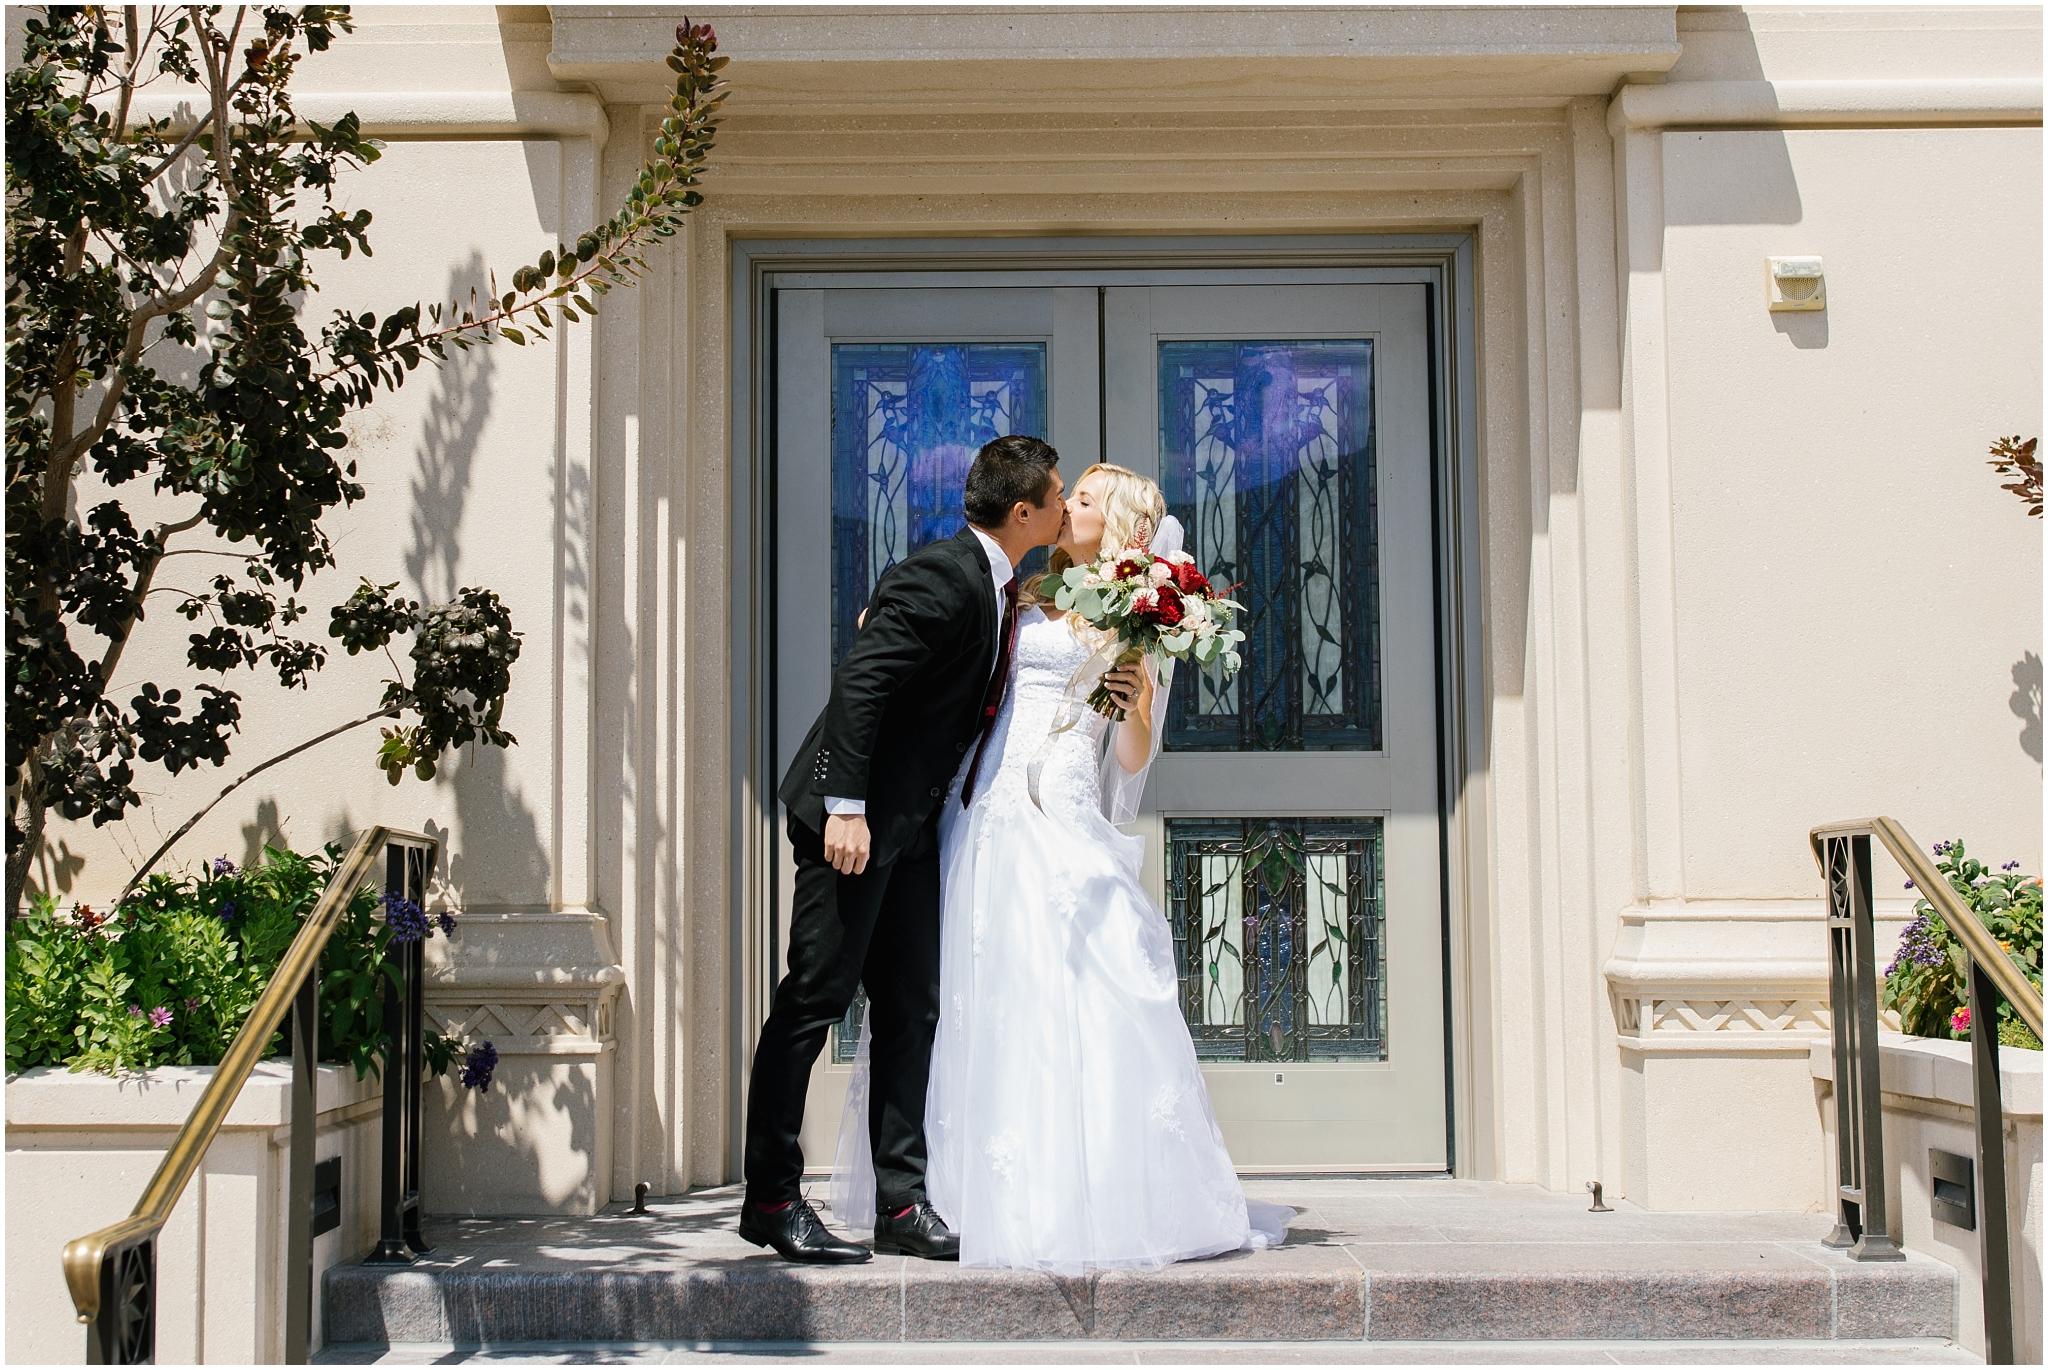 HannahChaseWedding-8_Lizzie-B-Imagery-Utah-Wedding-Photographer-Park-City-Salt-Lake-City-Payson-Temple-Clarion-Garden-Center.jpg